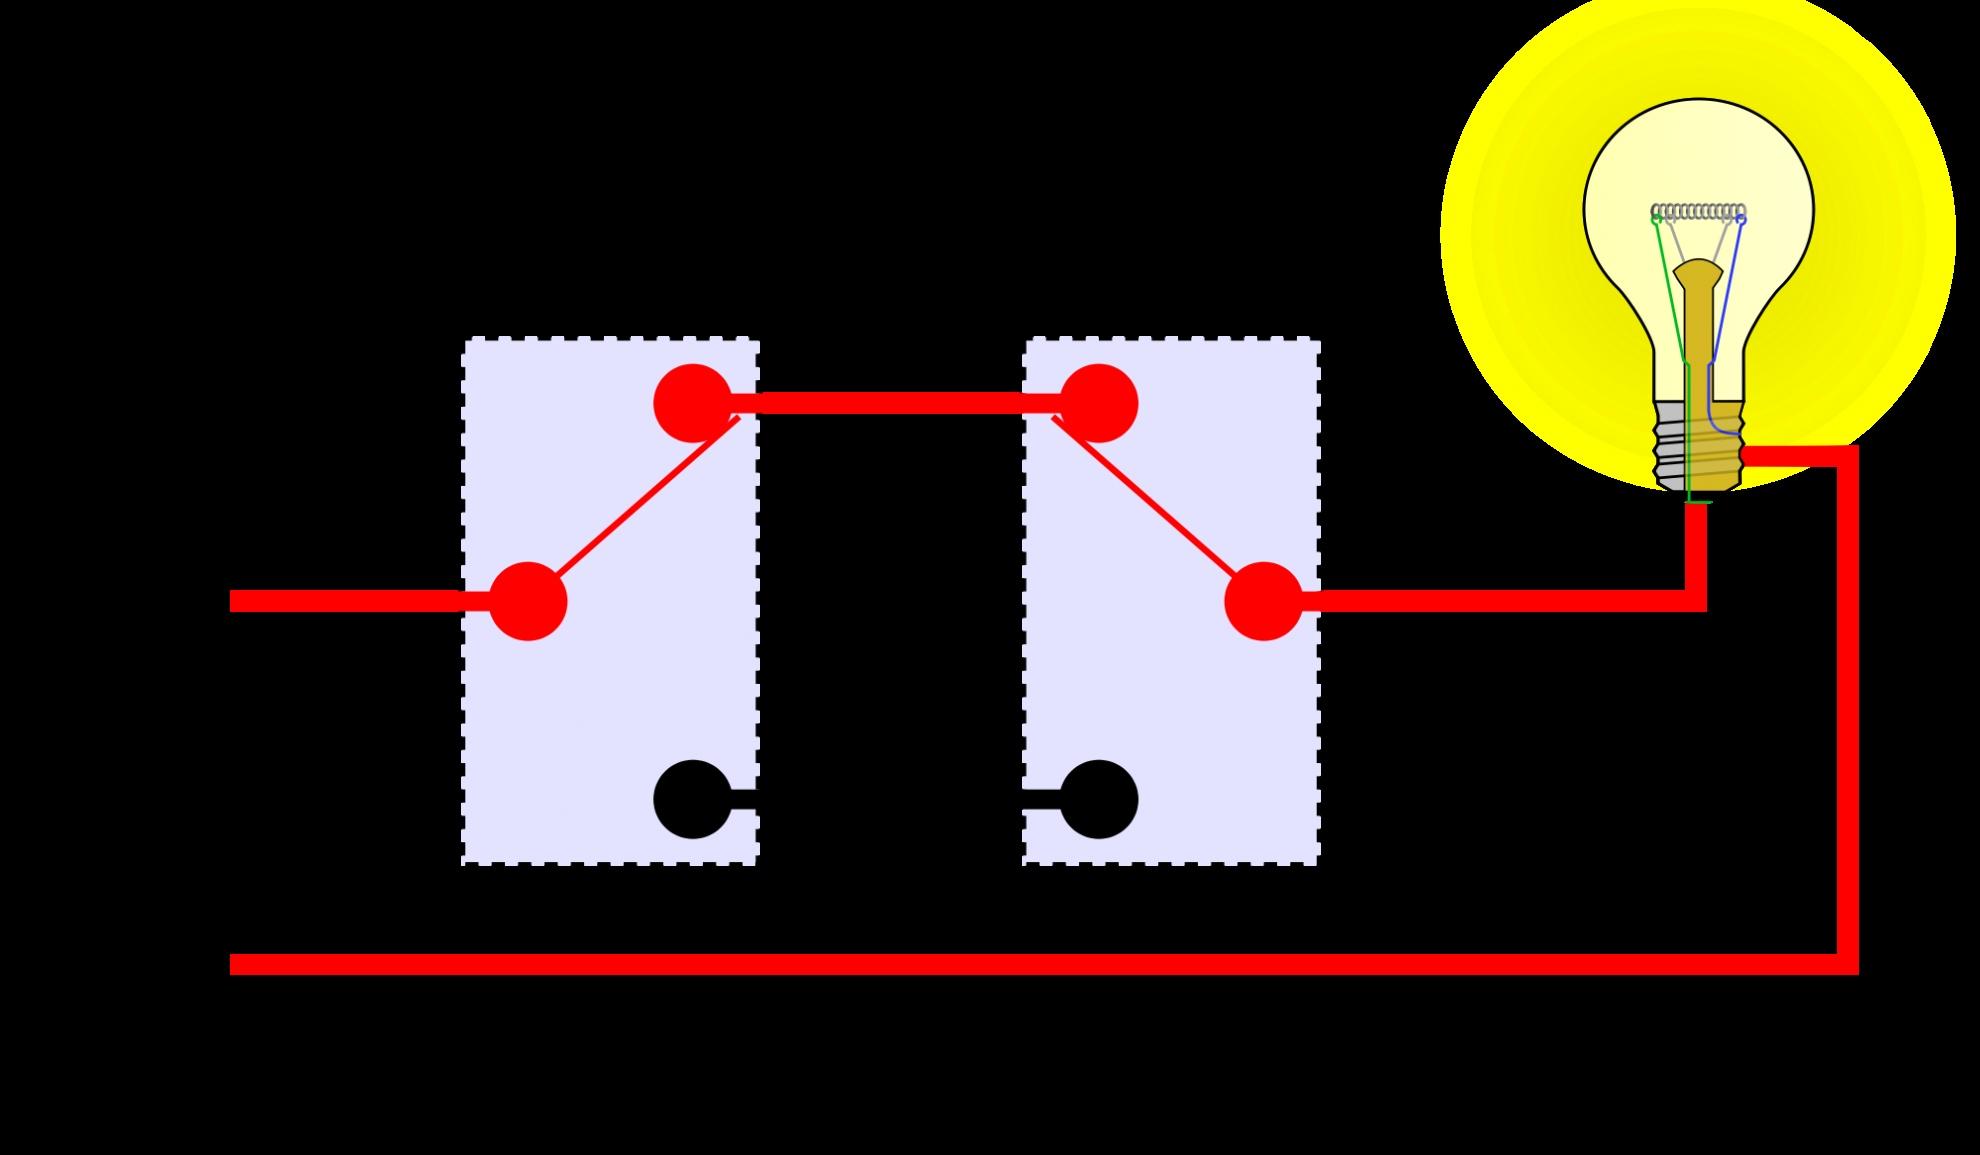 4 Way Switch Wiring Diagram Multiple Lights Pdf Best 4 Way Light –  Way Switch Wiring Diagram Pdf on 4 way switch timer, 4 way switch building diagram, 4 way lighting diagram, 4 way light diagram, 4 way wall switch diagram, 6-way light switch diagram, 5-way light switch diagram, 4-way circuit diagram, 3-way switch diagram, 4 way dimmer switch diagram, 4 way switch troubleshooting, 4 way switch circuit, 4 way switch wire, 4 way switch ladder diagram, 4 way switch operation, easy 4-way switch diagram, 4 way switch installation, 4 way switch schematic,